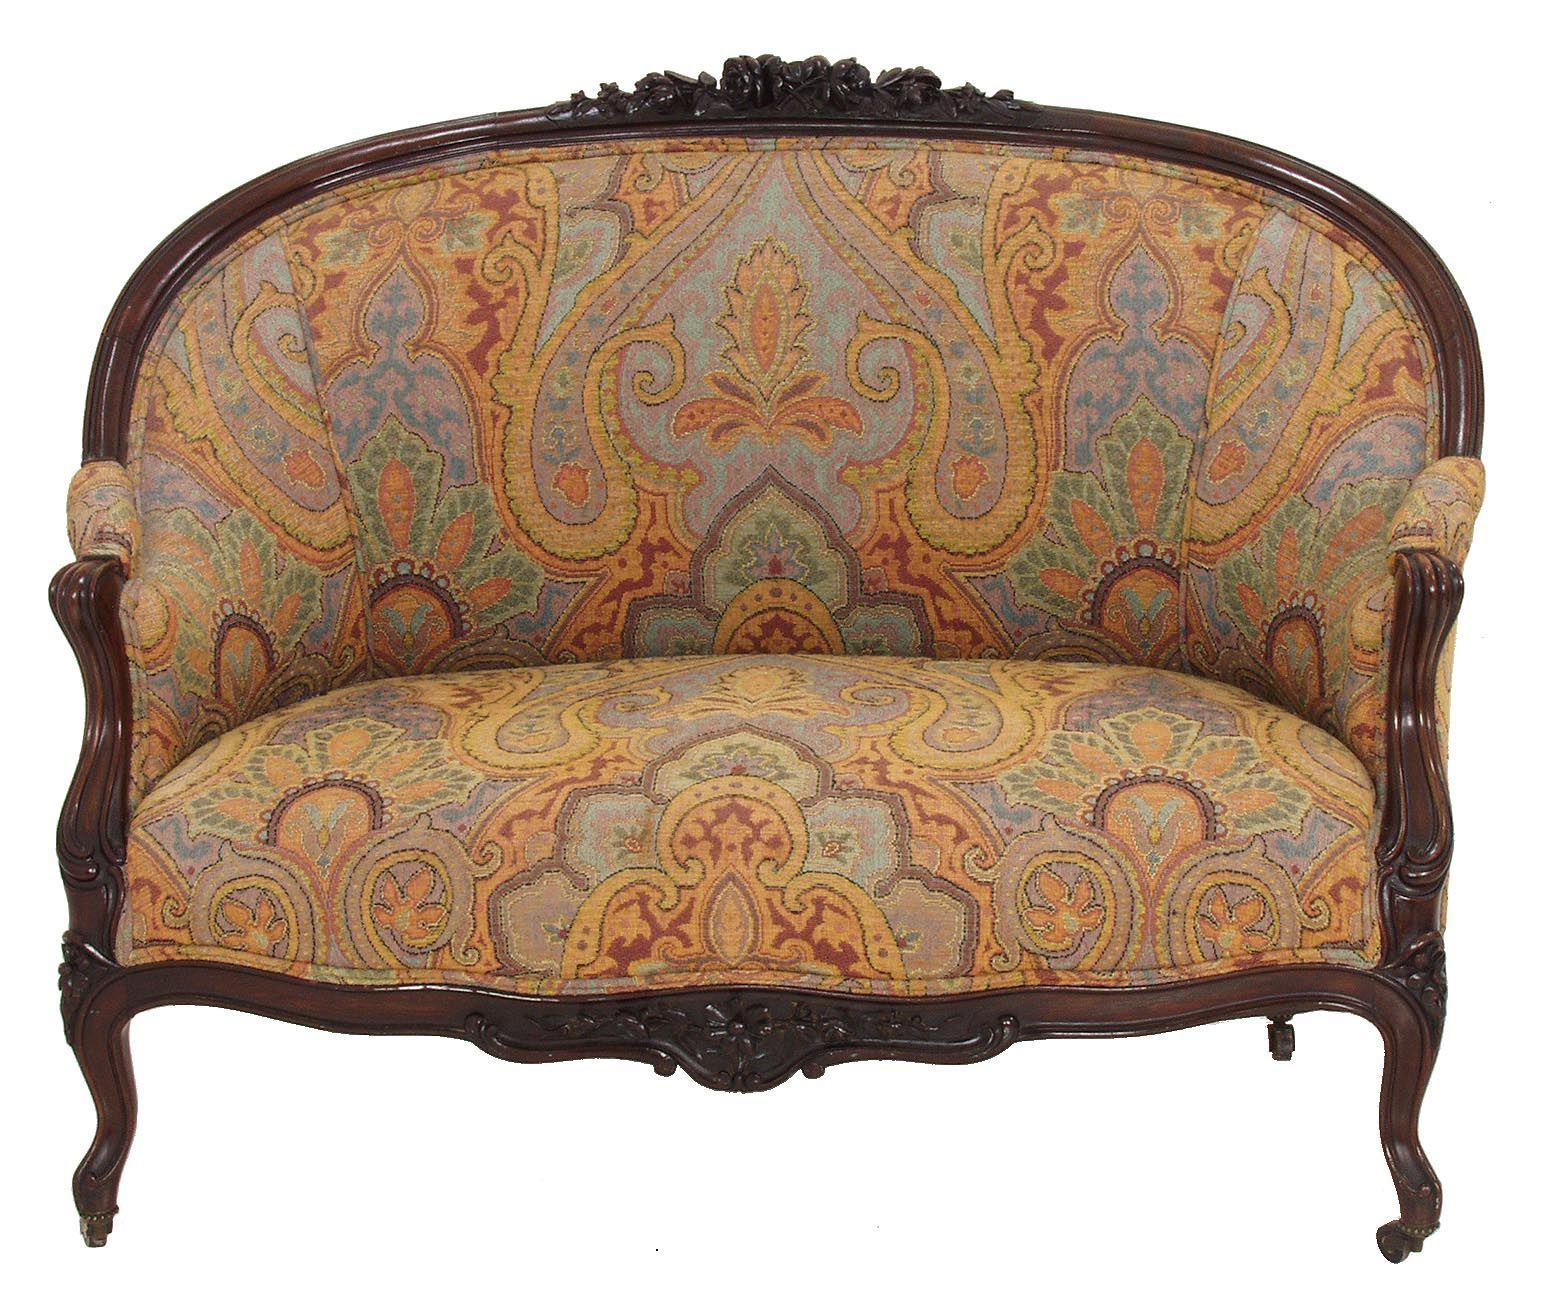 victorian furniture - Google Search - Victorian Furniture - Google Search The Victorian Era Pinterest